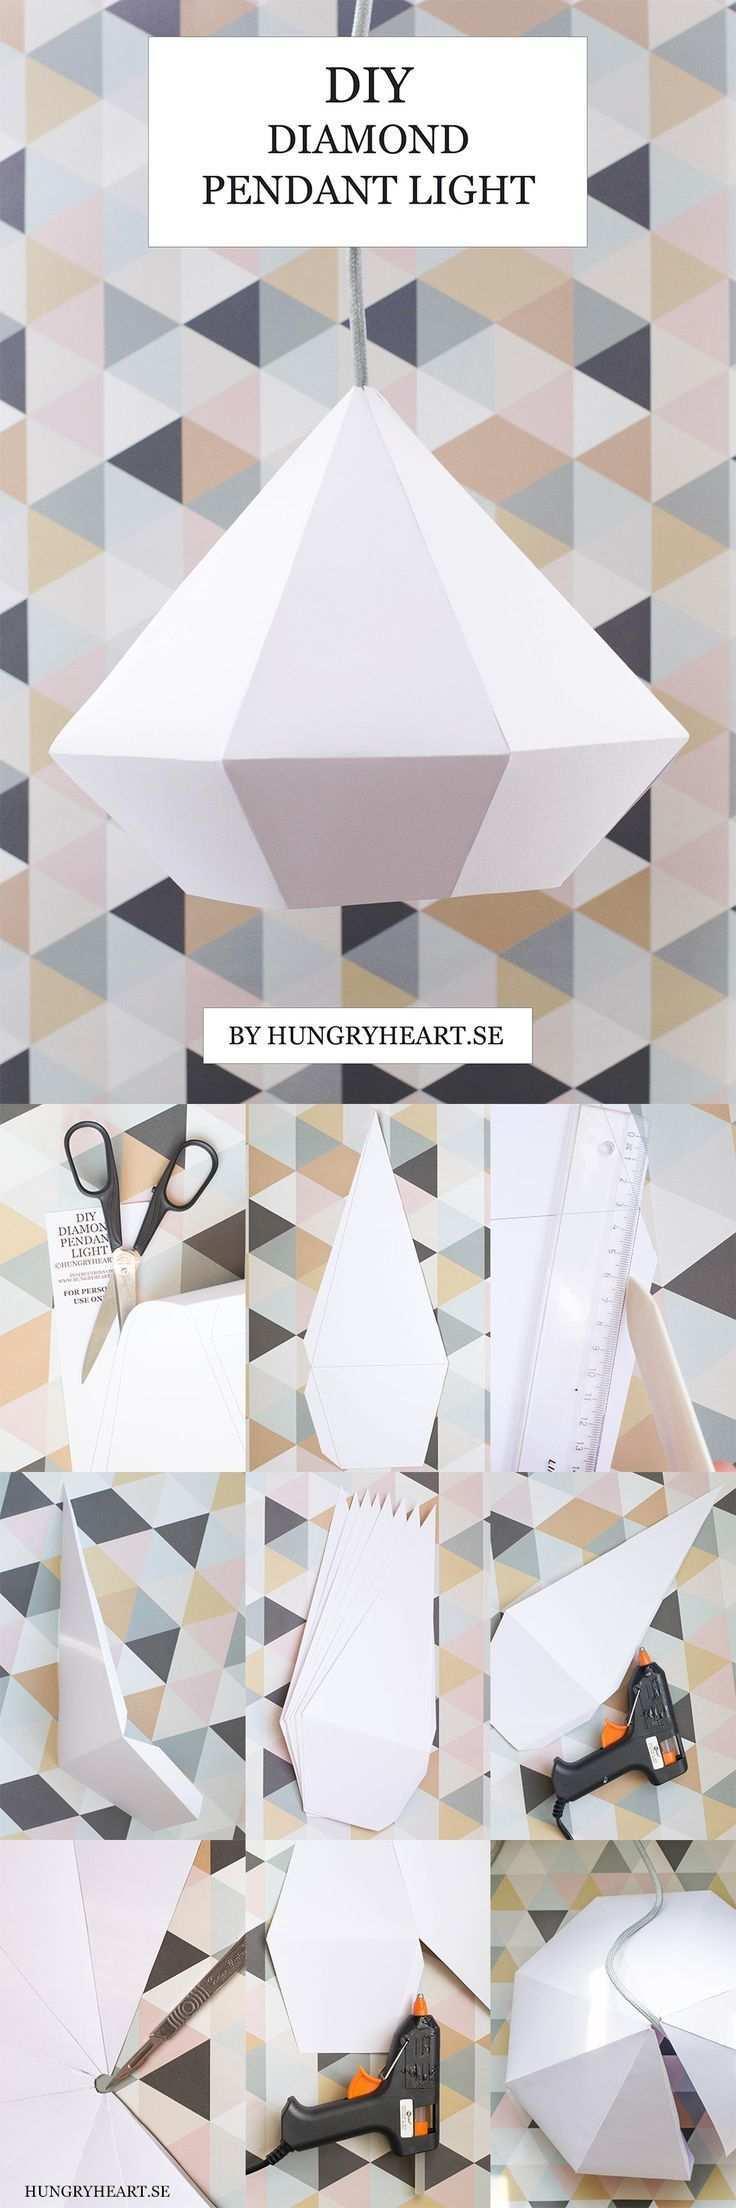 Diy Diamond Pendant Light With Free Template Origami Lampe Lumiere Suspendue Diy